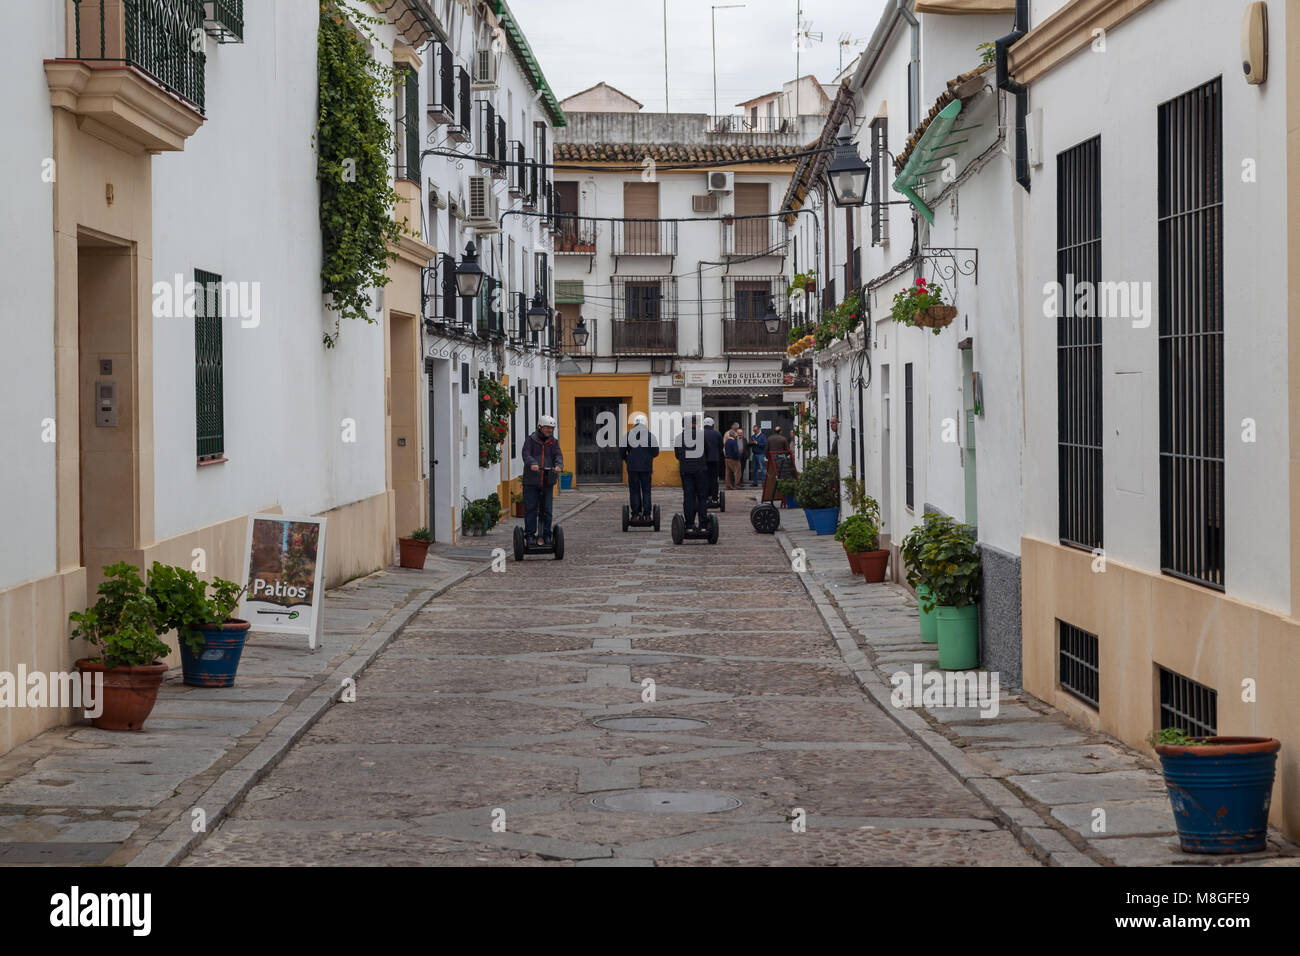 En Segway Por Las Calles De Espana Cordoba Foto Imagen De Stock